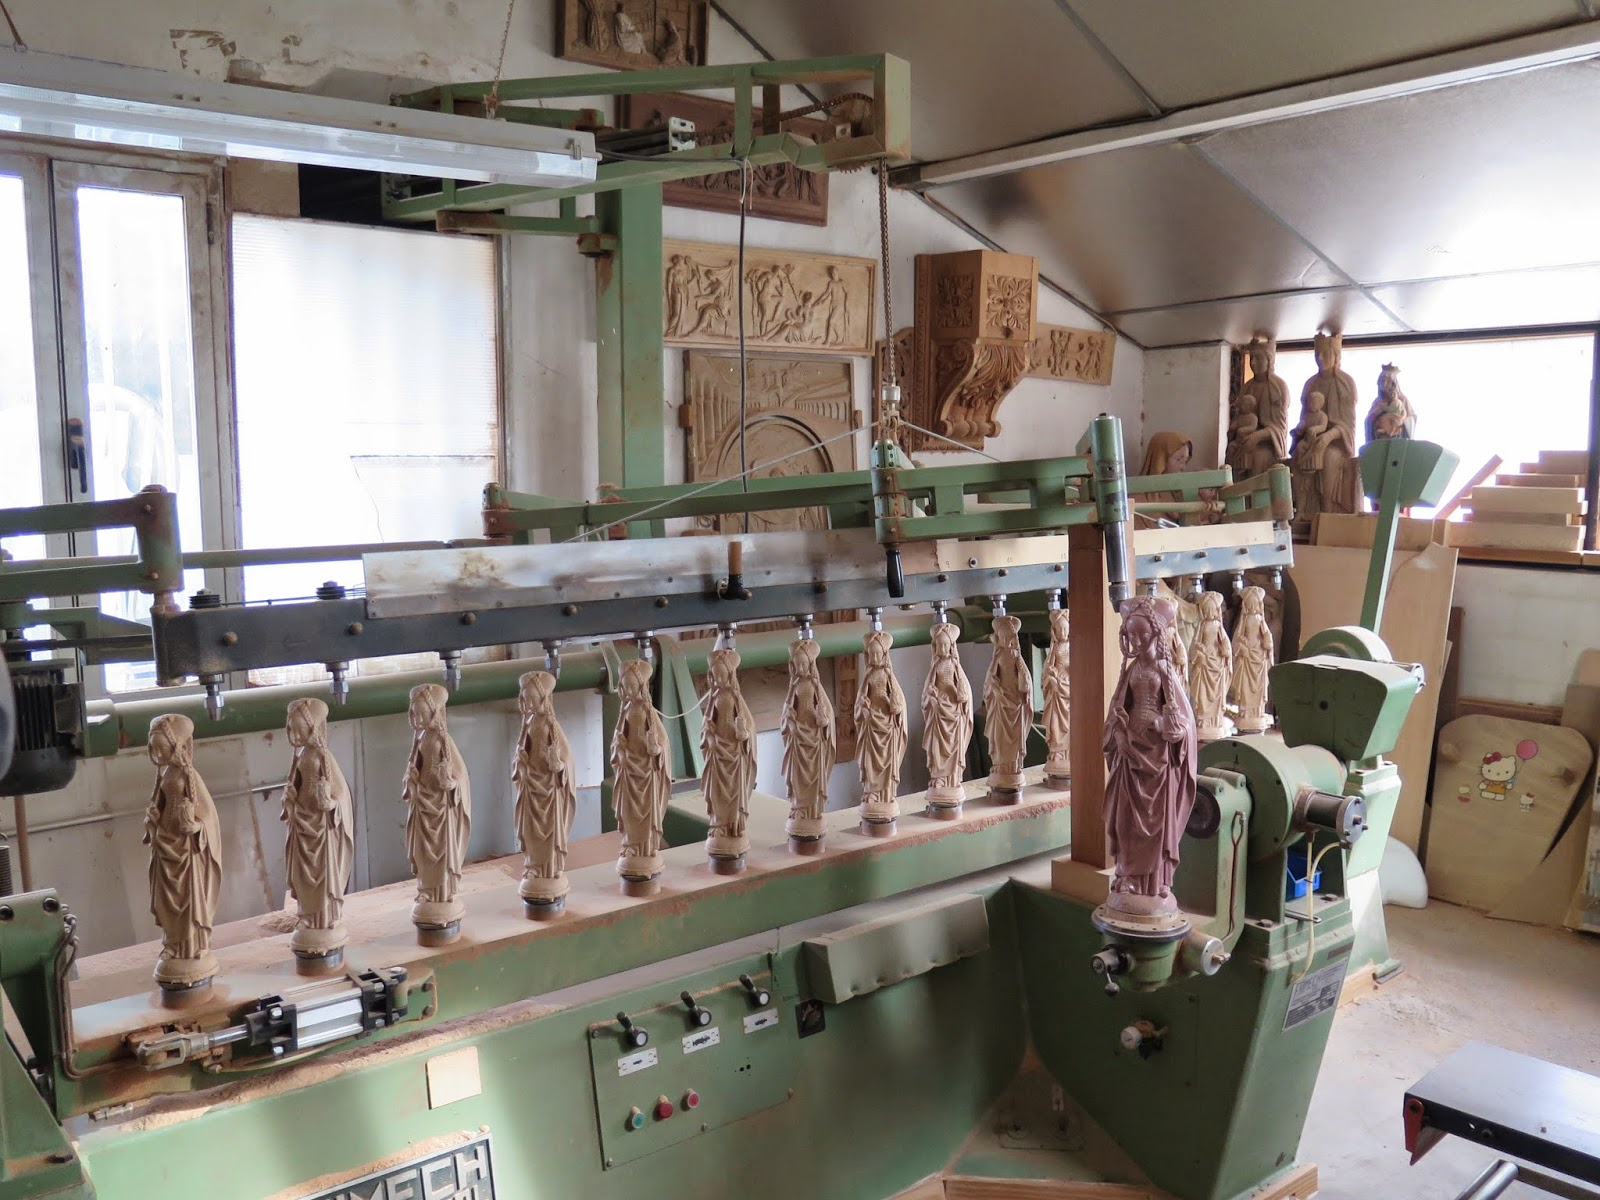 esculturas y moldes numa pantógrafo